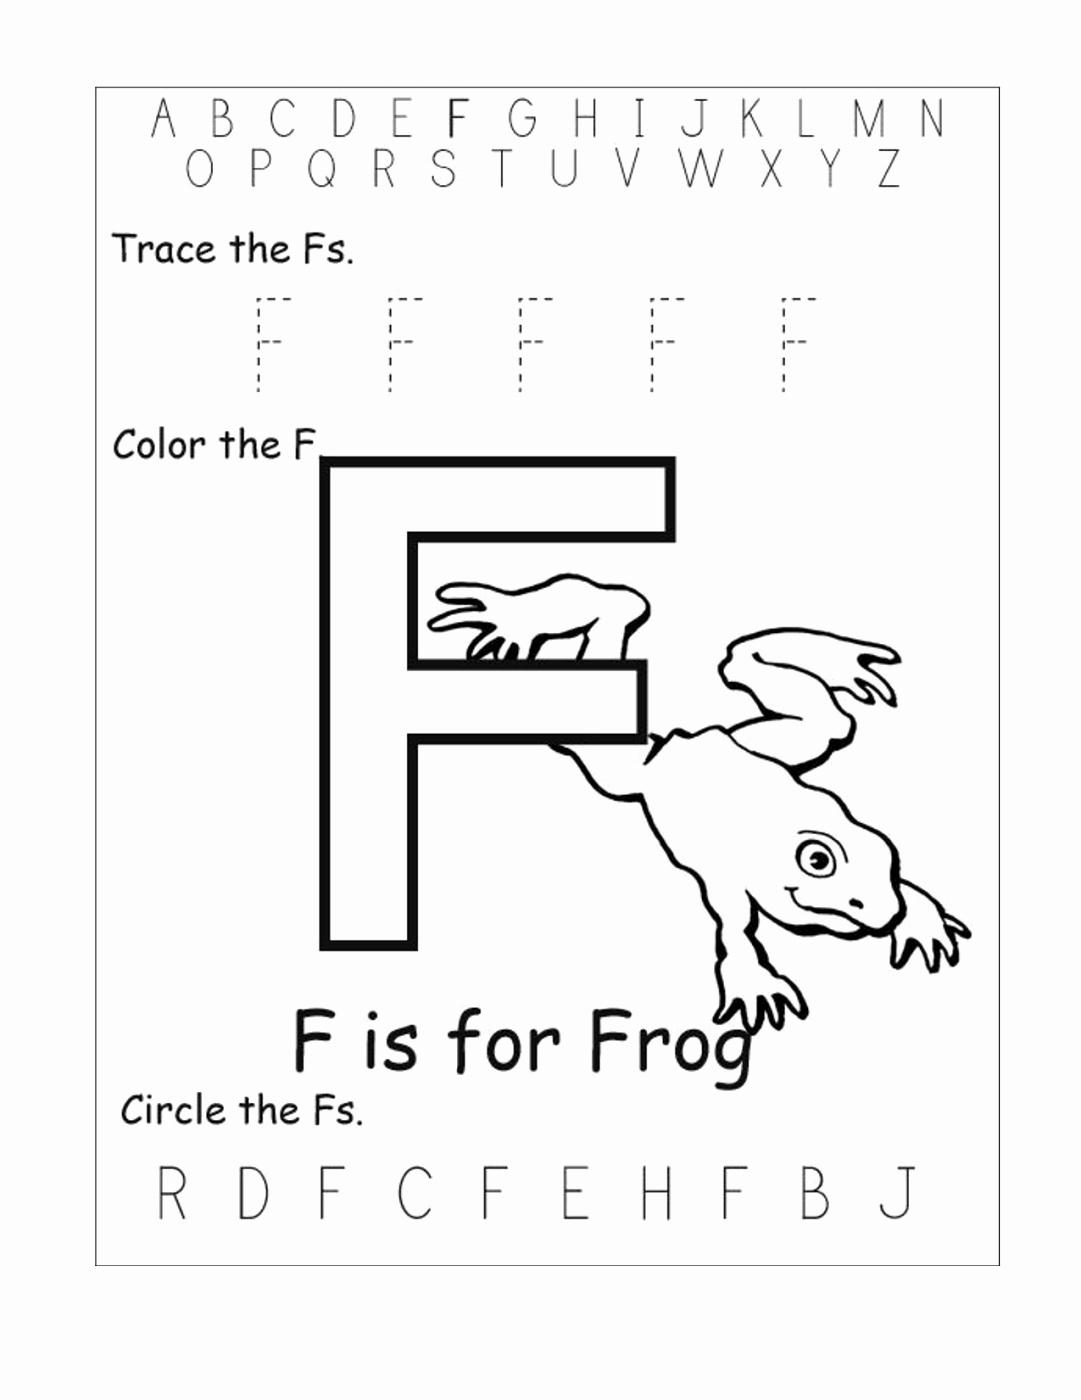 F Worksheets for Preschool Best Of 15 Useful Letter F Worksheets for toddlers